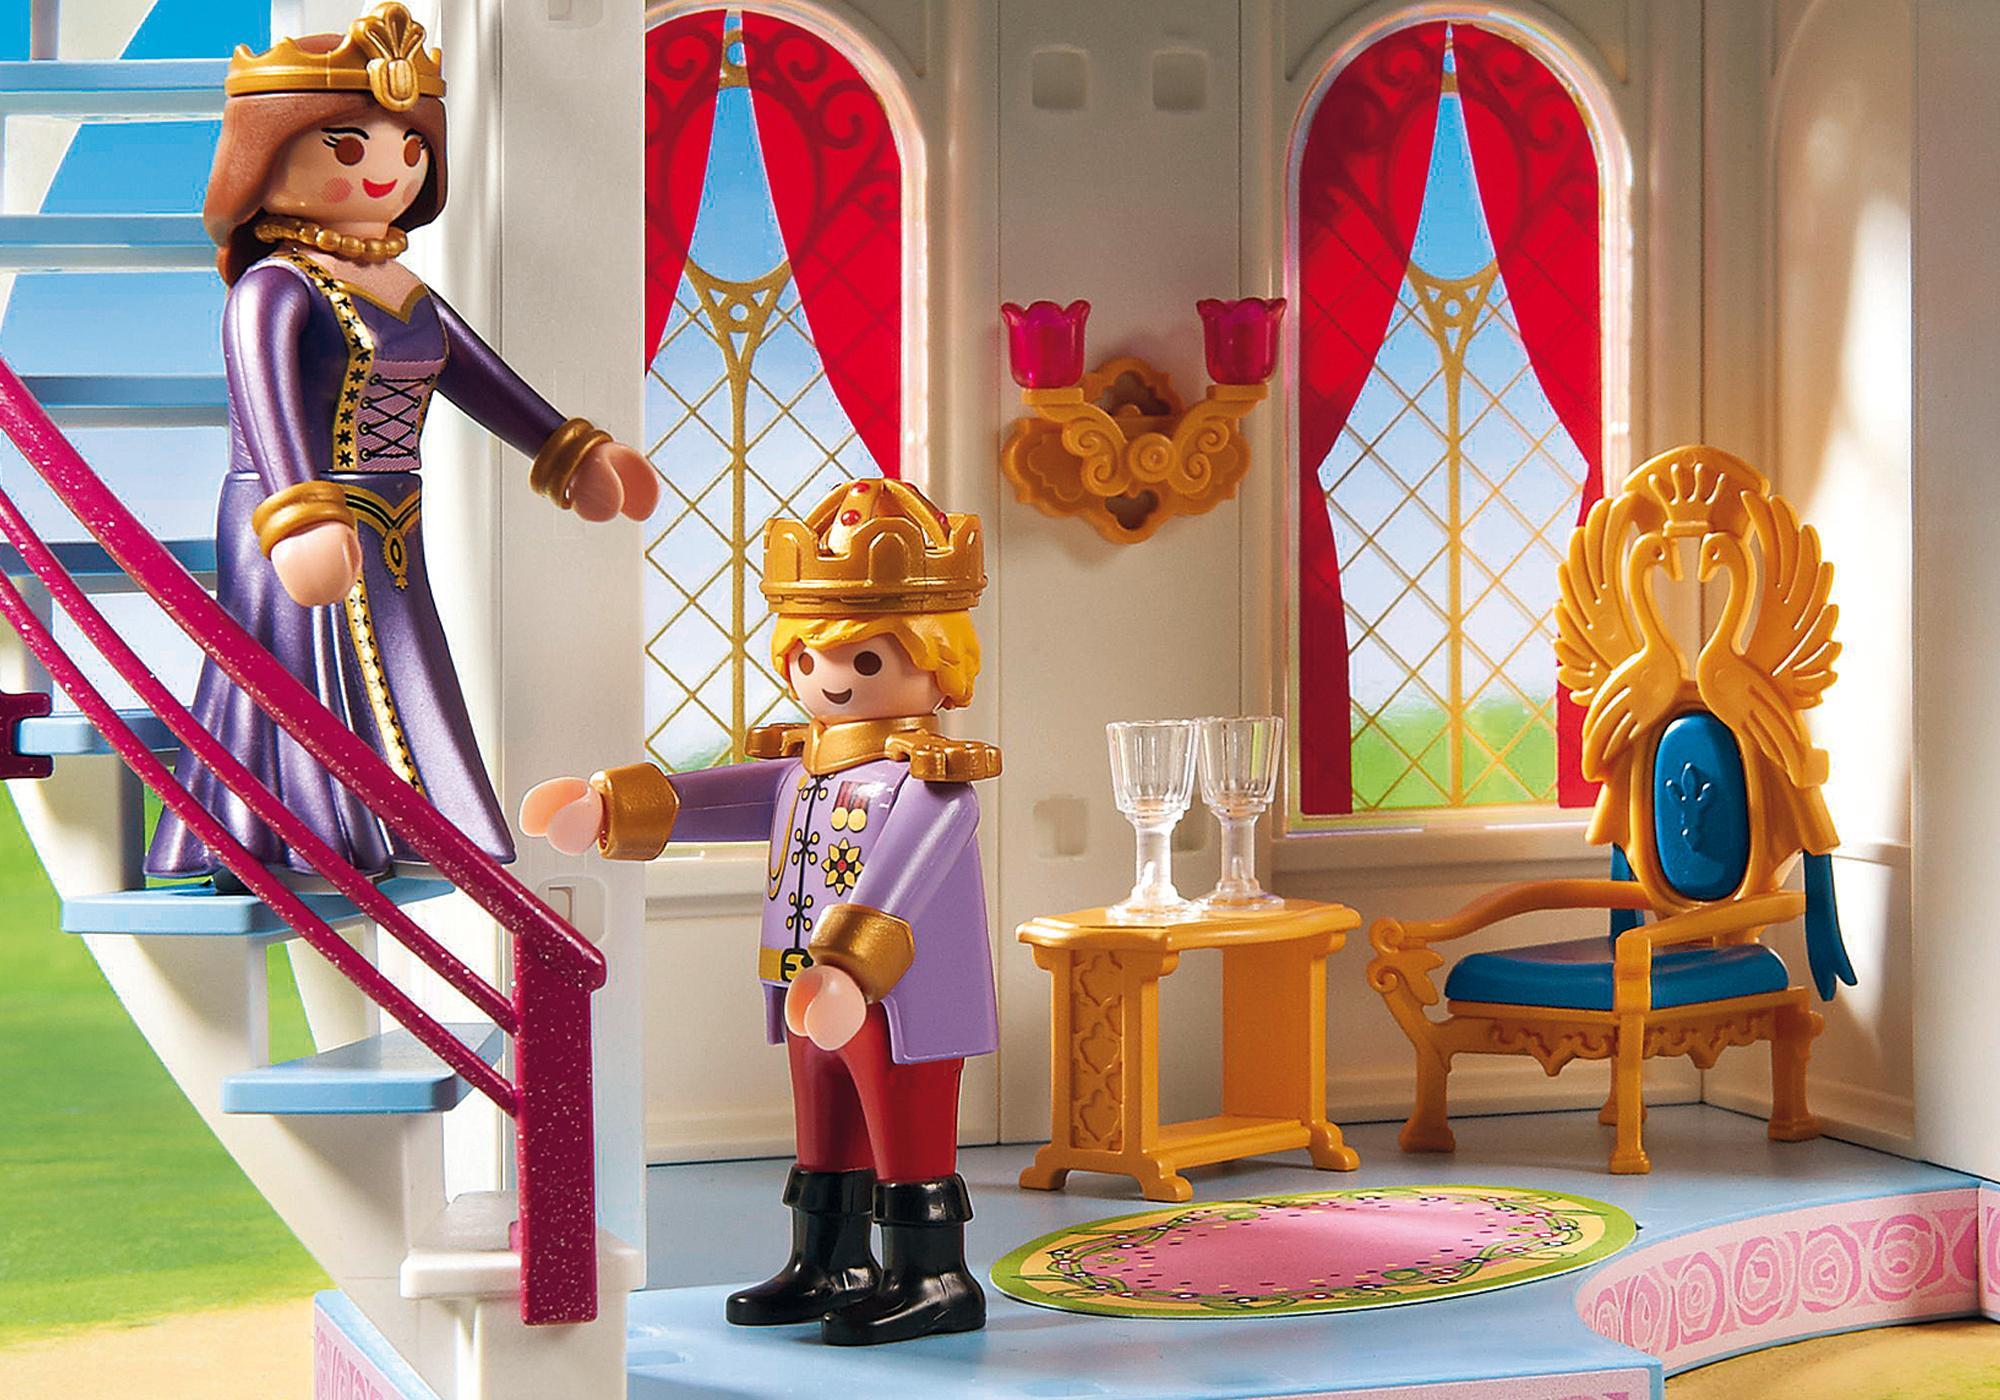 http://media.playmobil.com/i/playmobil/6849_product_extra2/Замок Принцессы: Королевская Резиденция